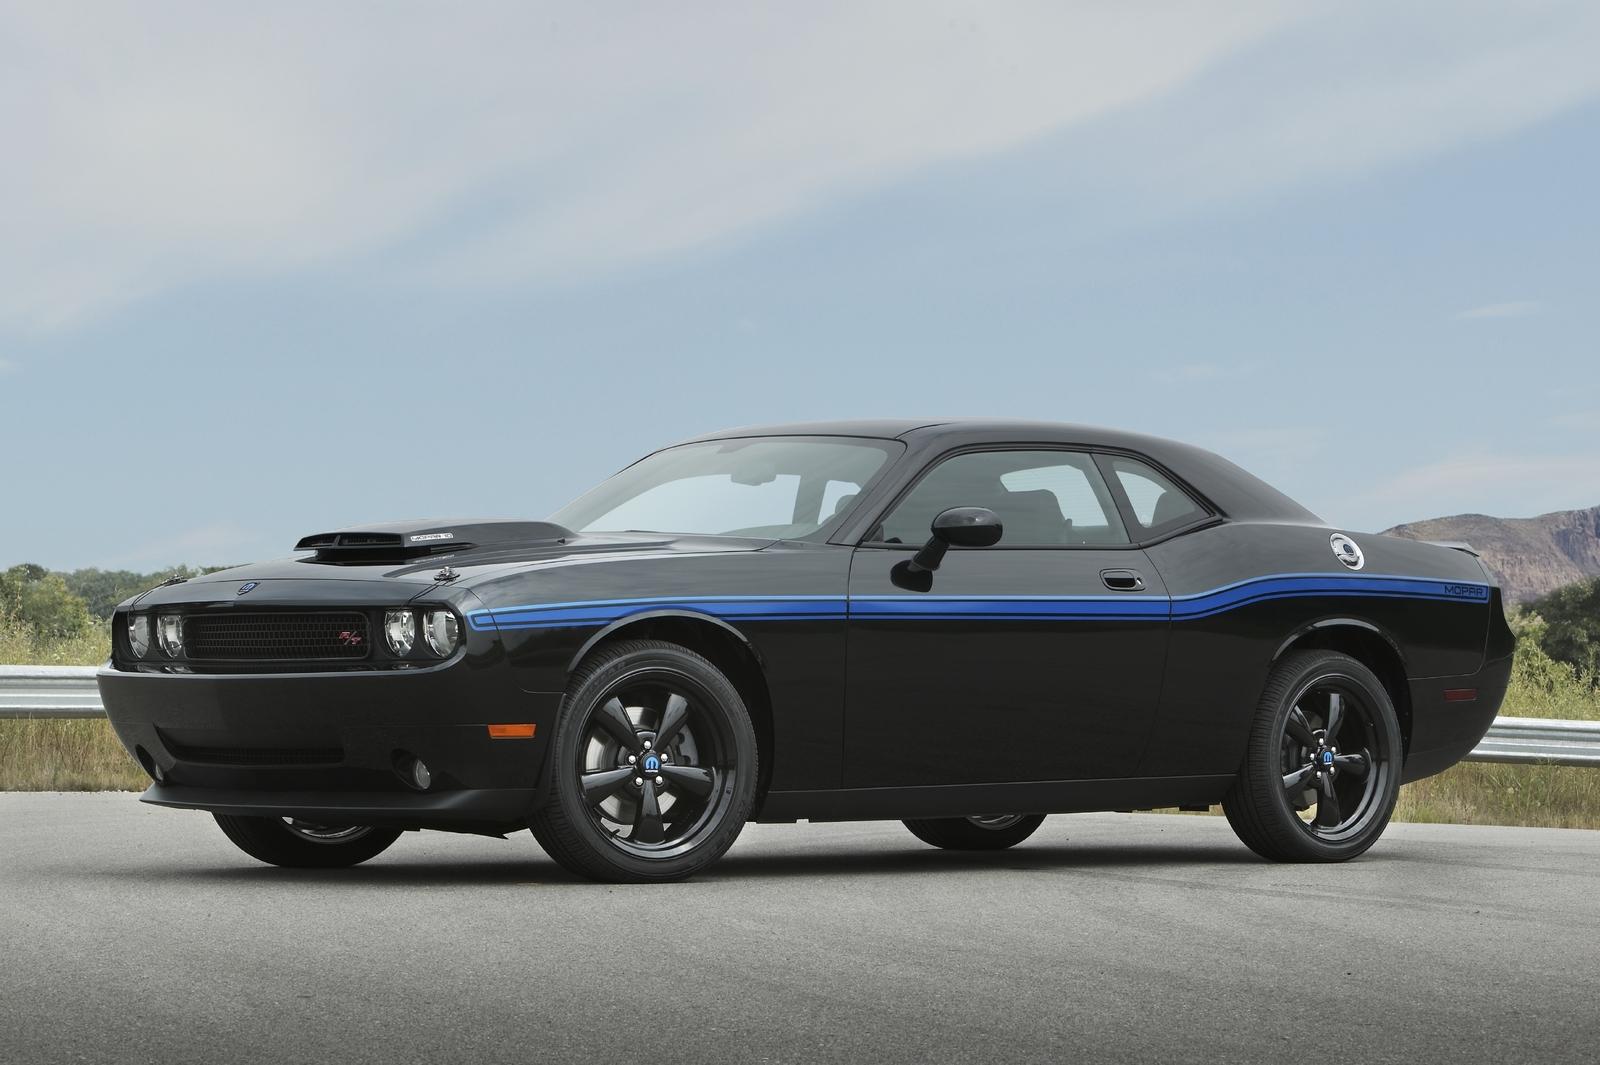 Dodge reveals Mopar \'10 Challenger